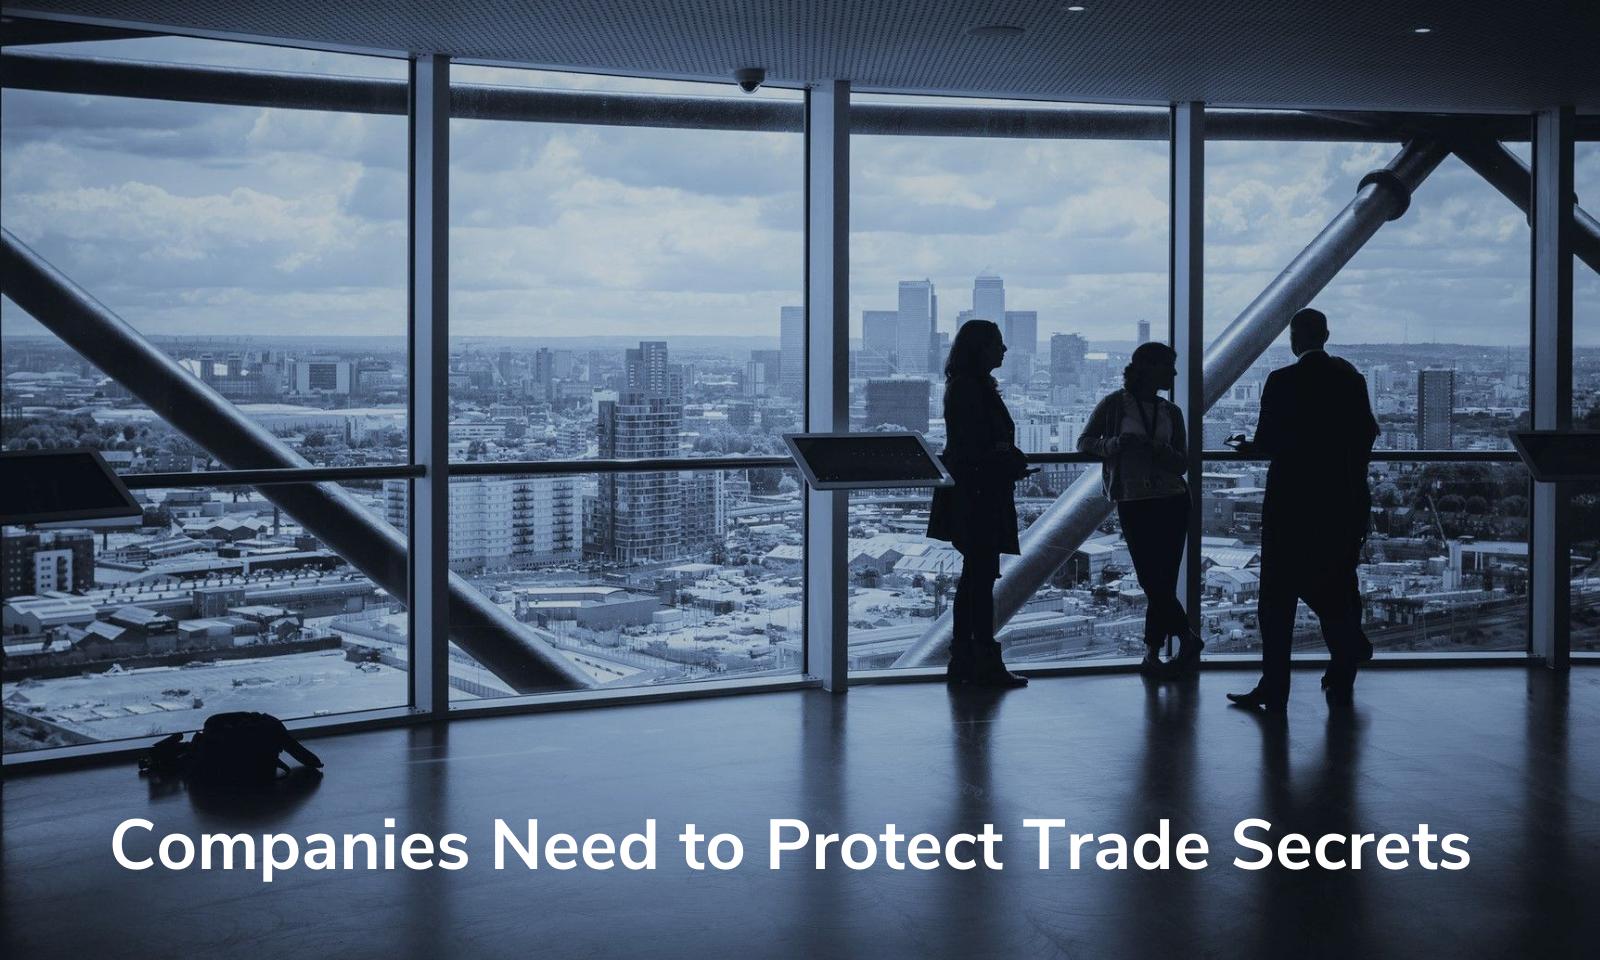 Companies Need to Protect Trade Secrets